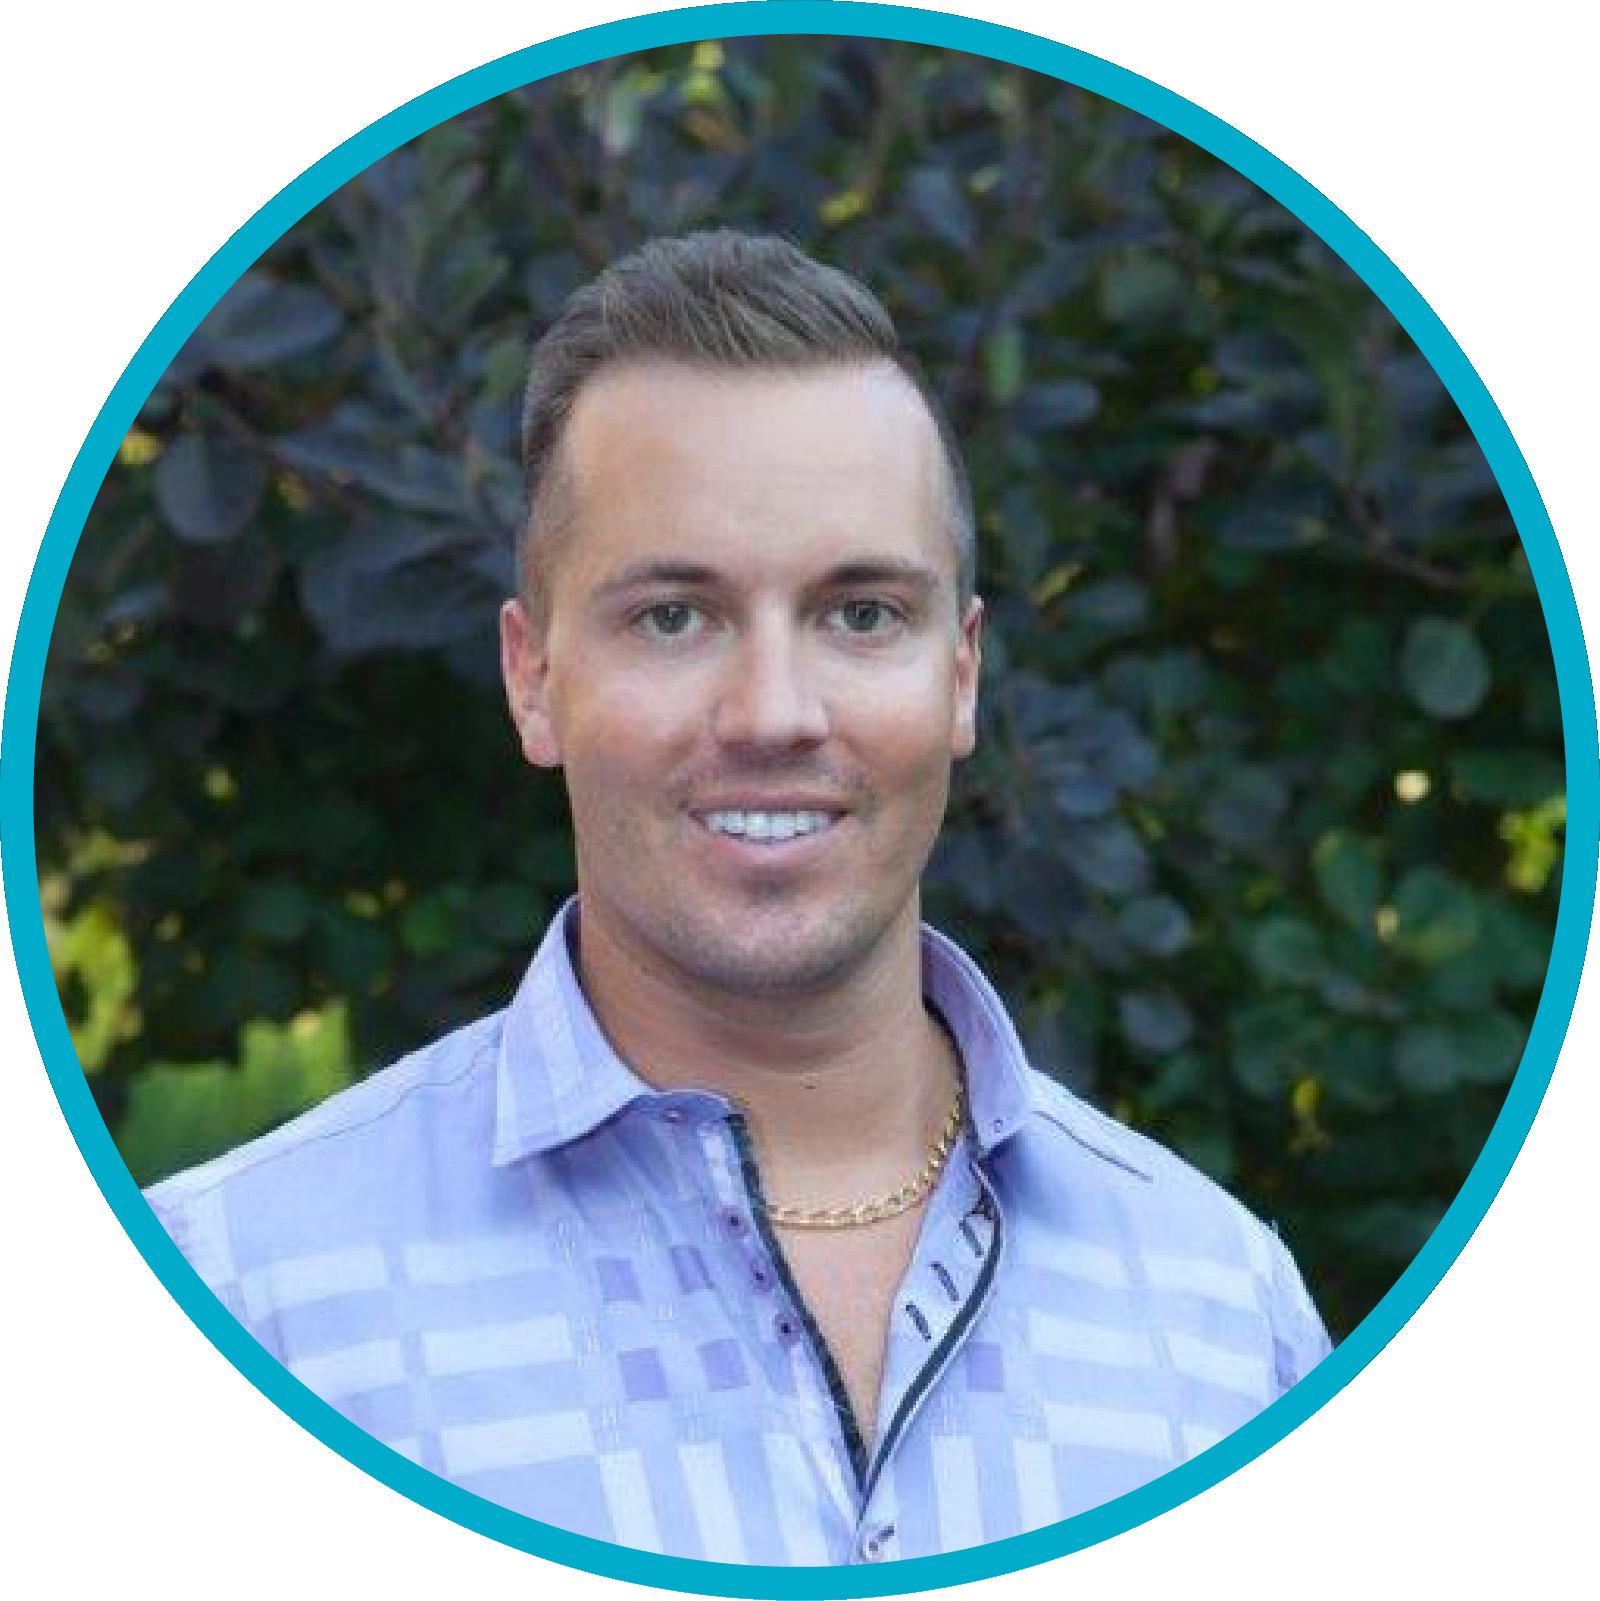 West Kelowna Dentist, Kevin Head | True Dental